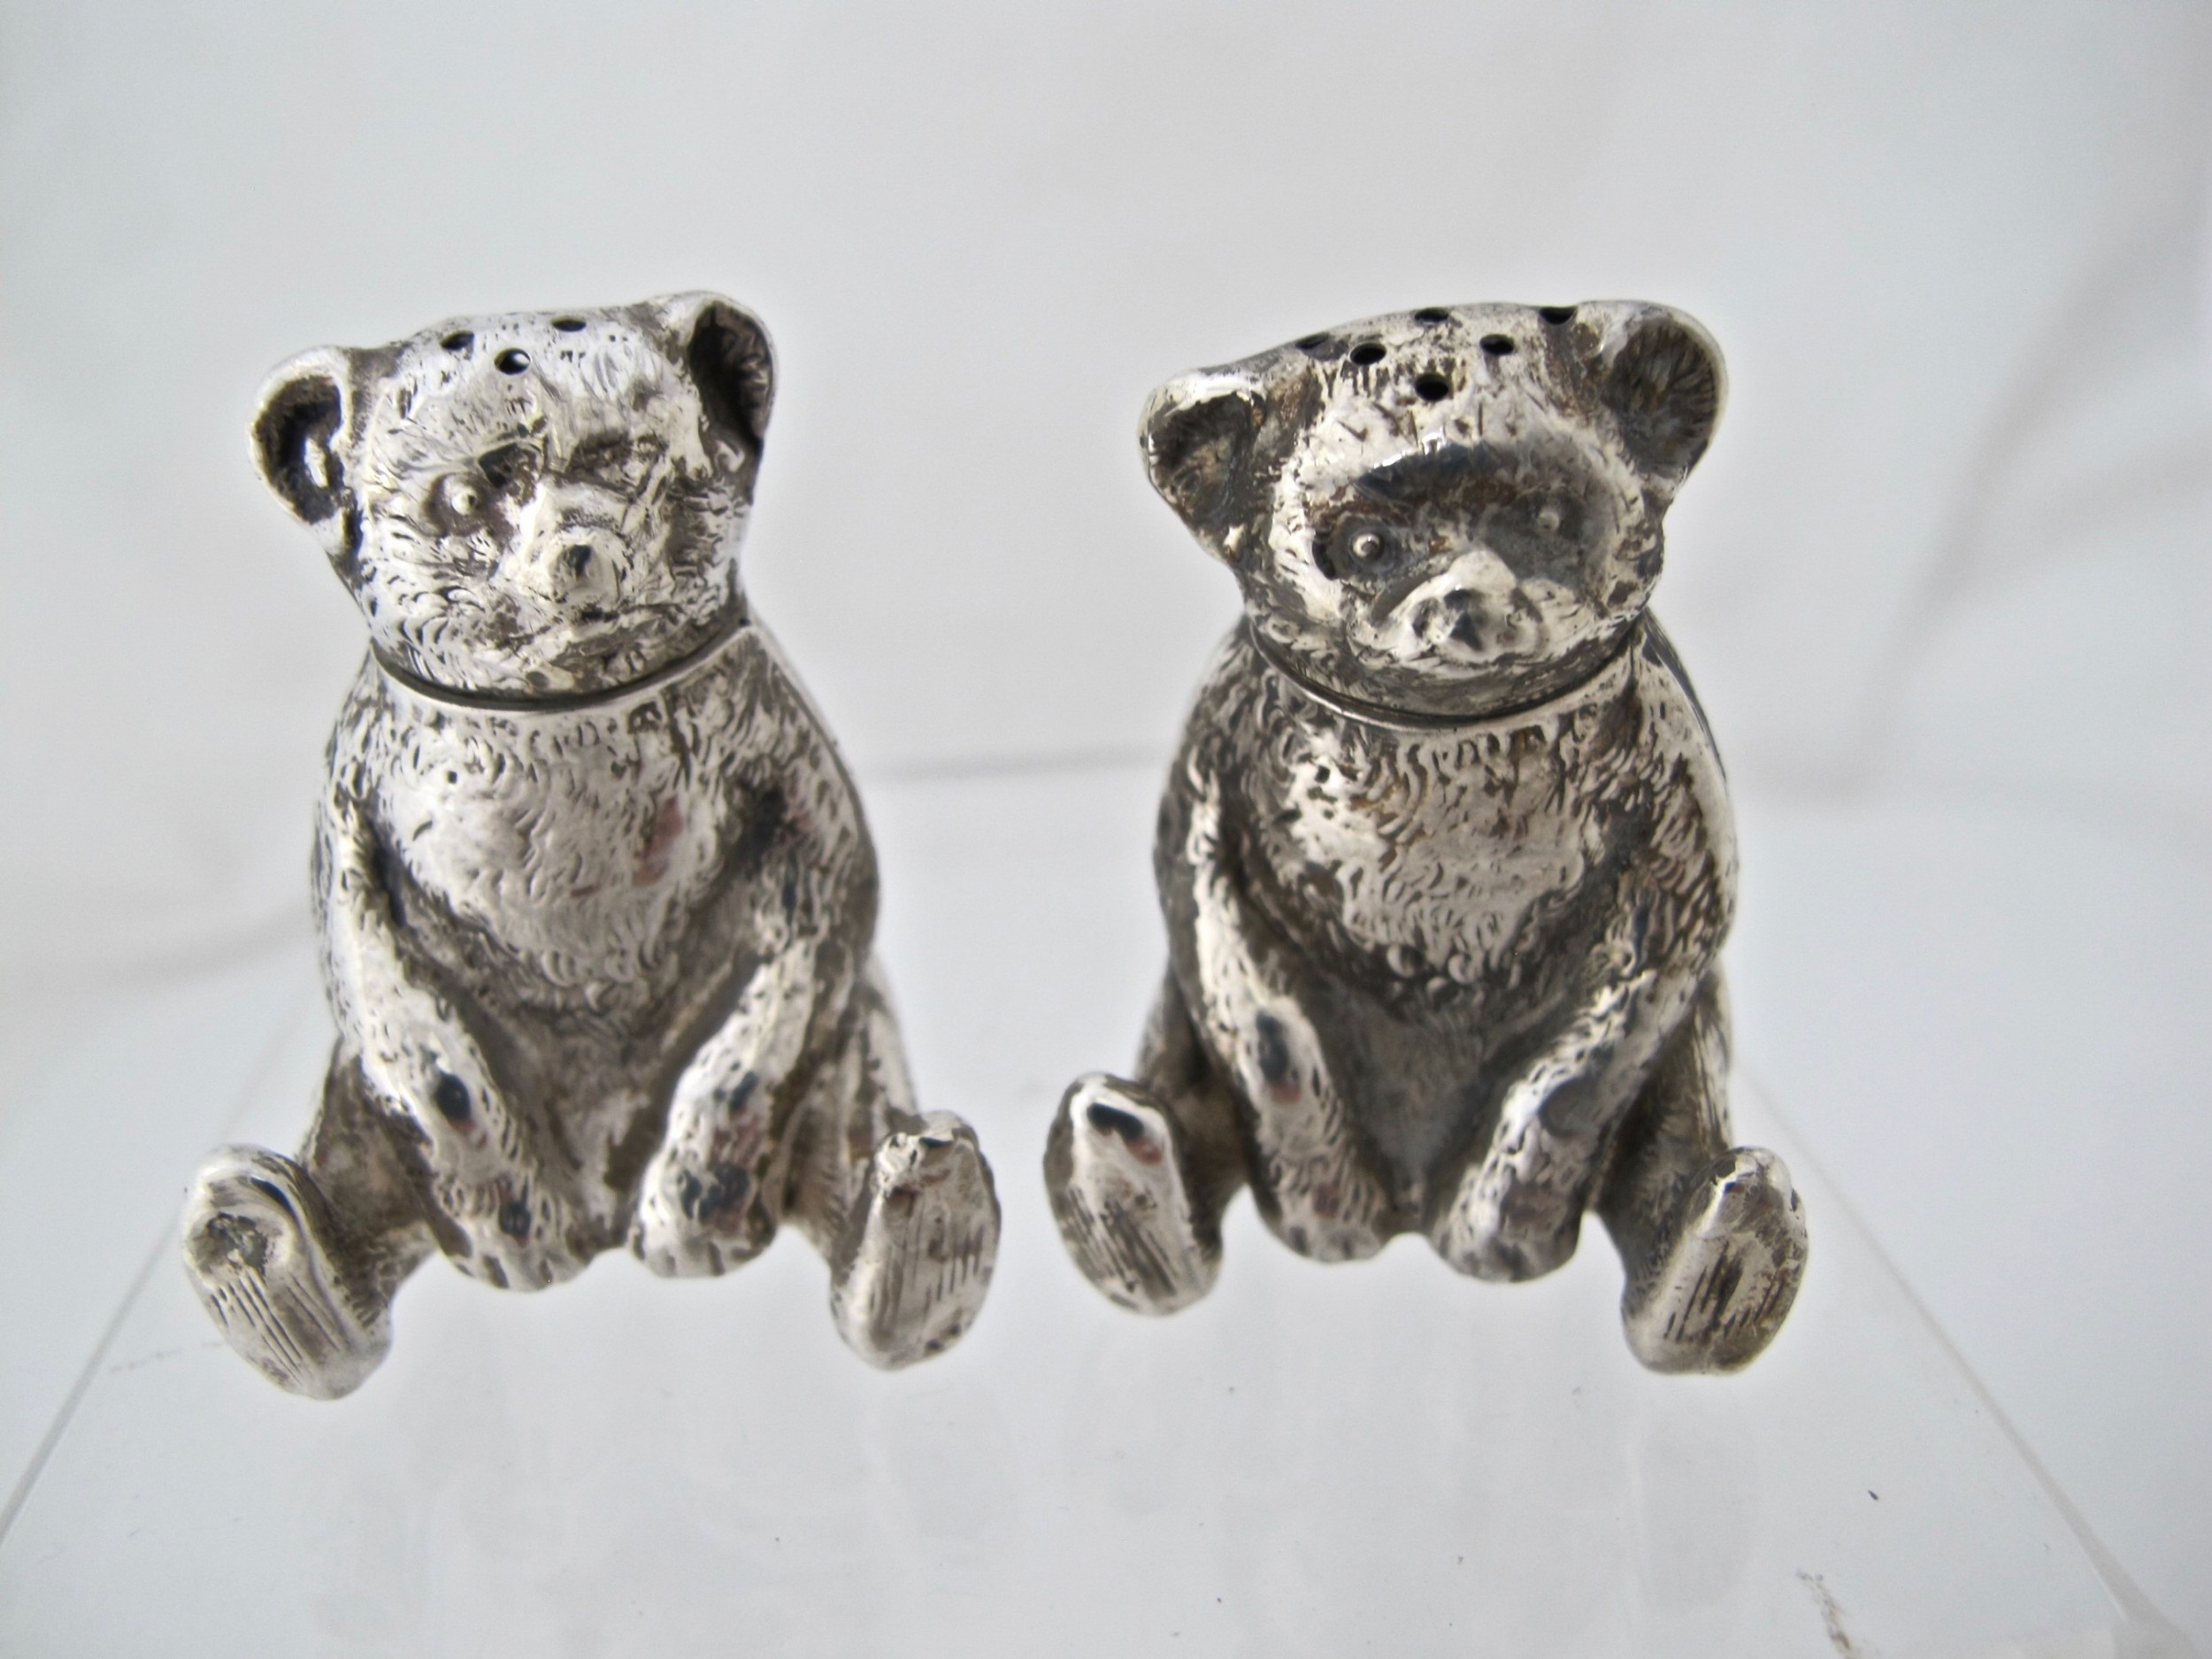 edwardian silver novelty teddybear pepper pots william vale and sons birmingham 1909